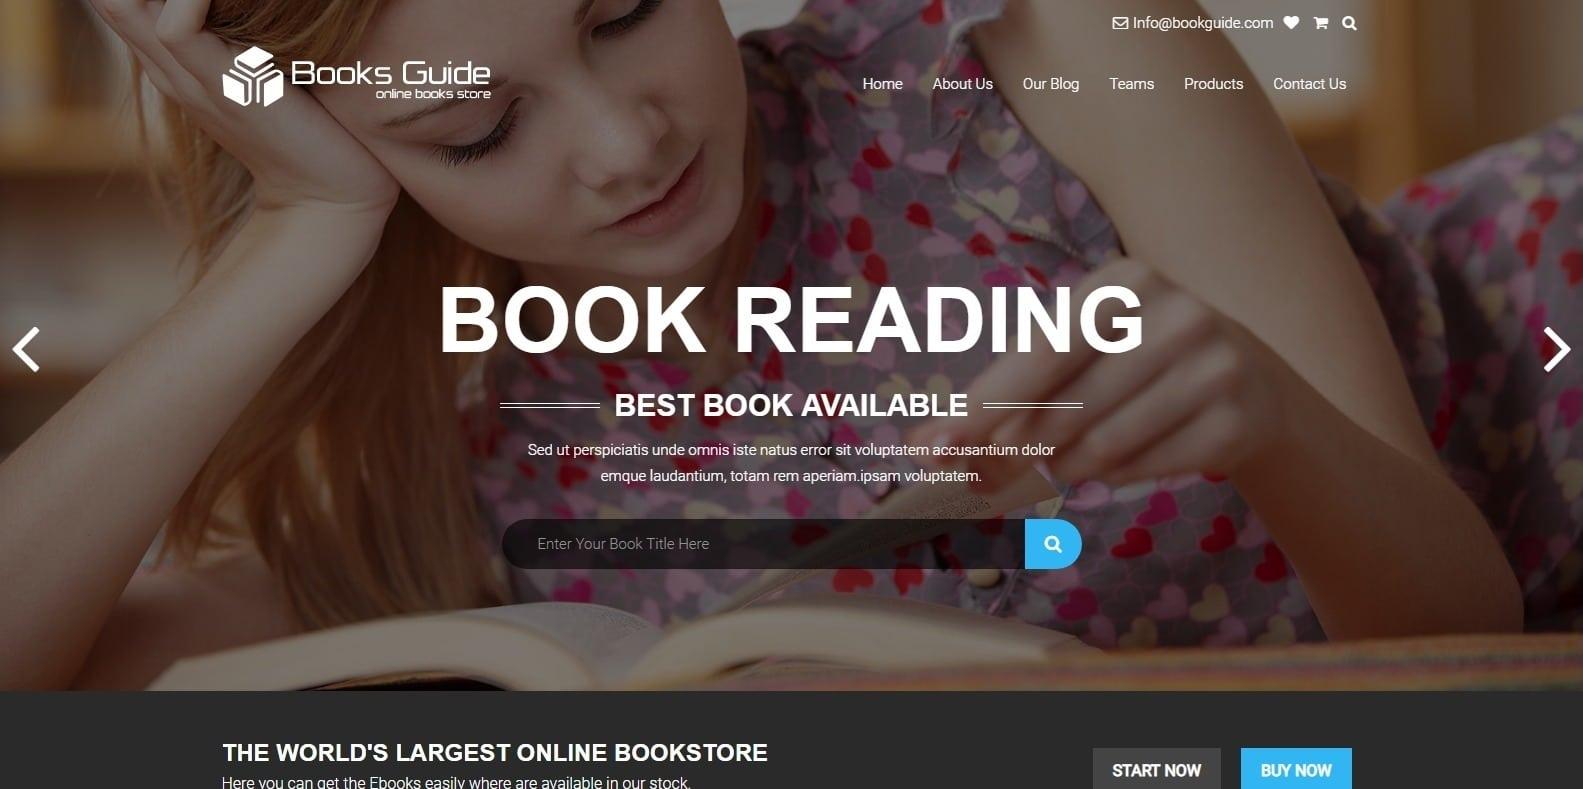 booksguide-html-bookstore-website-template